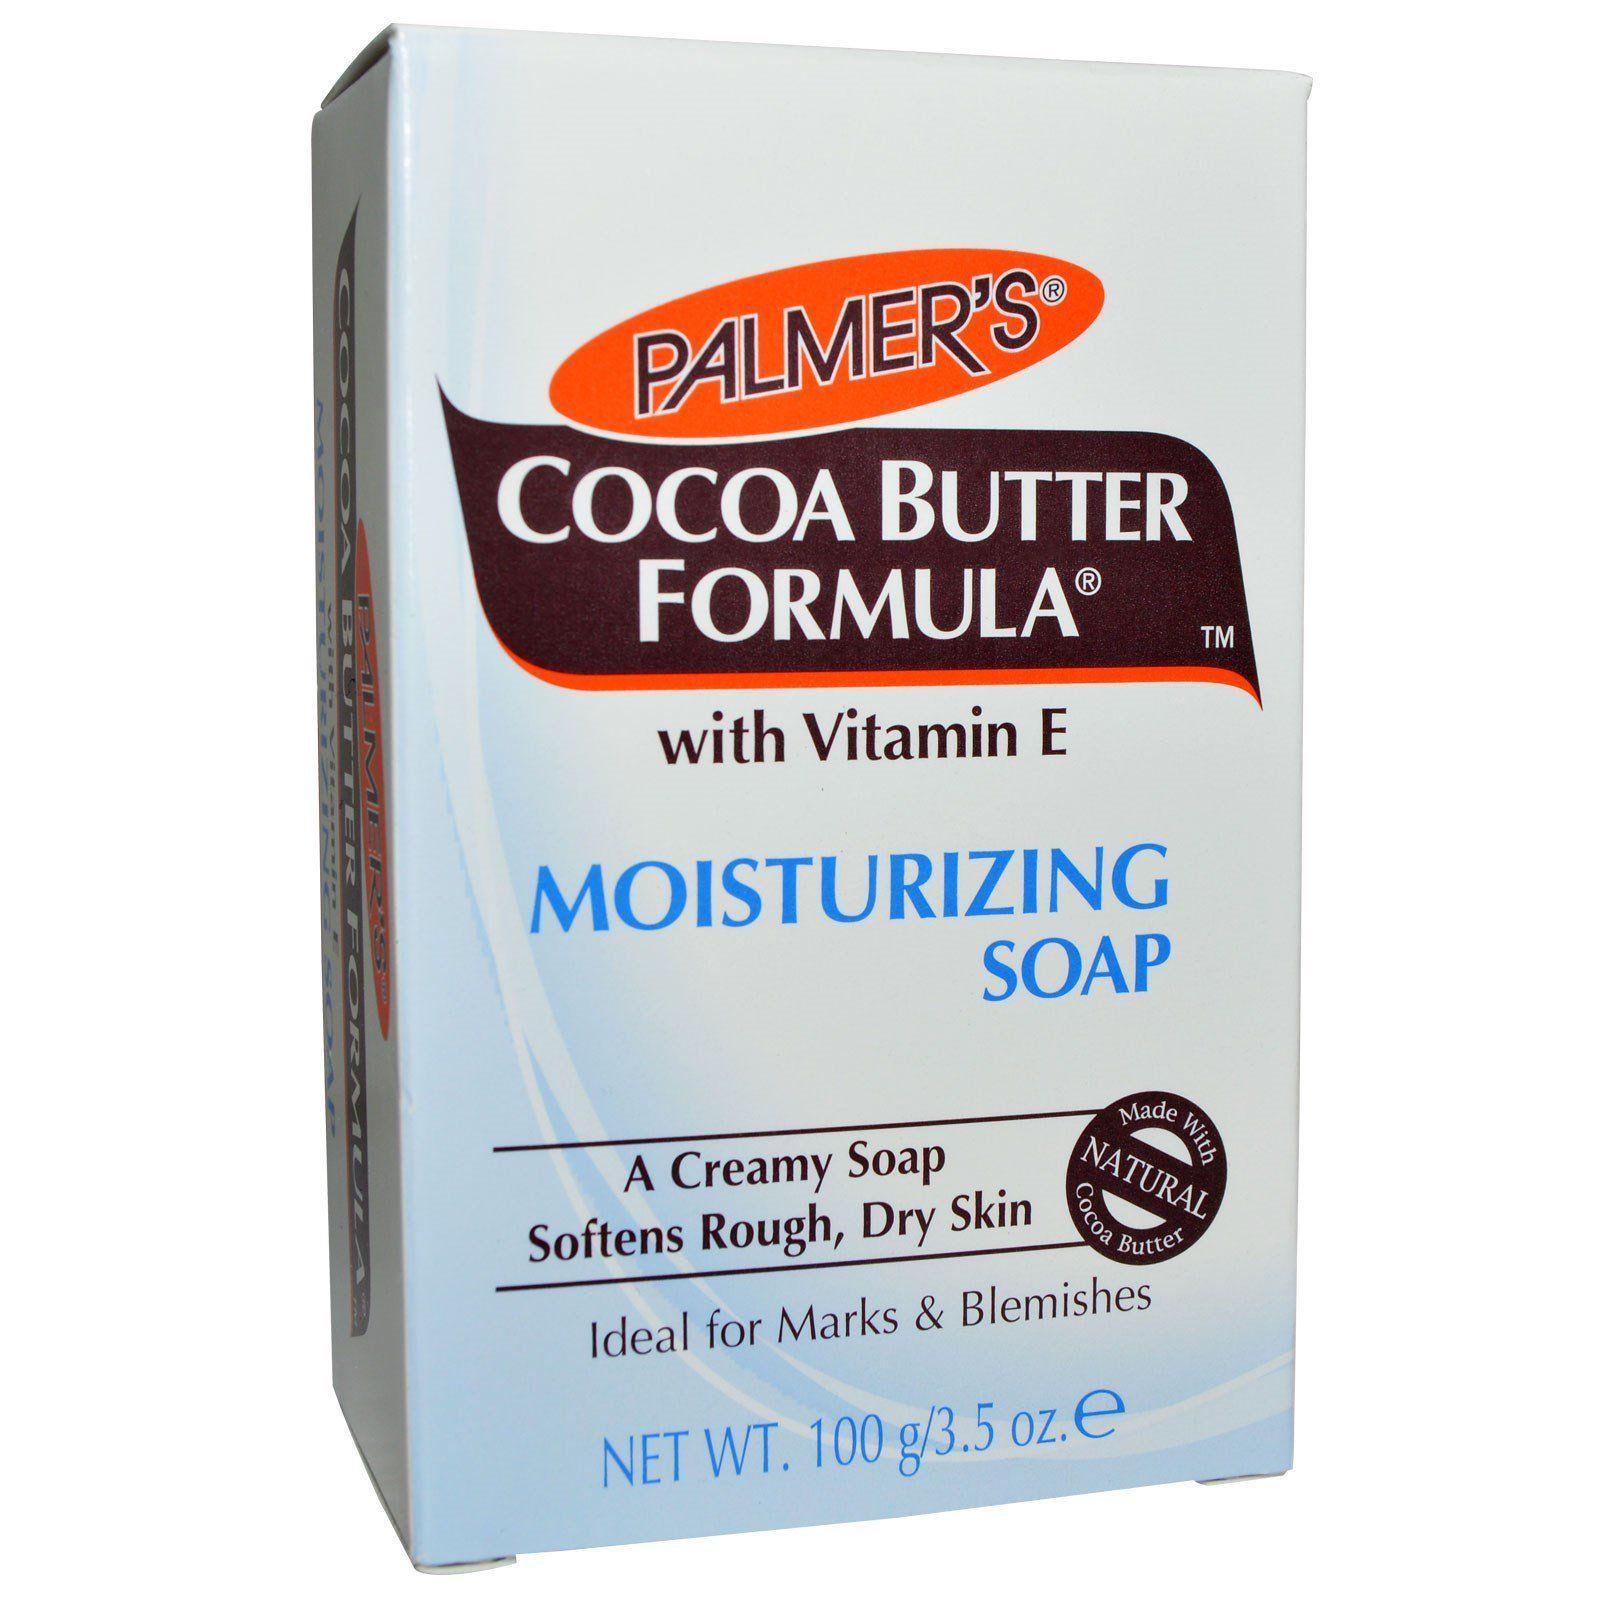 Palmer's Cocoa Butter Soap - 100g